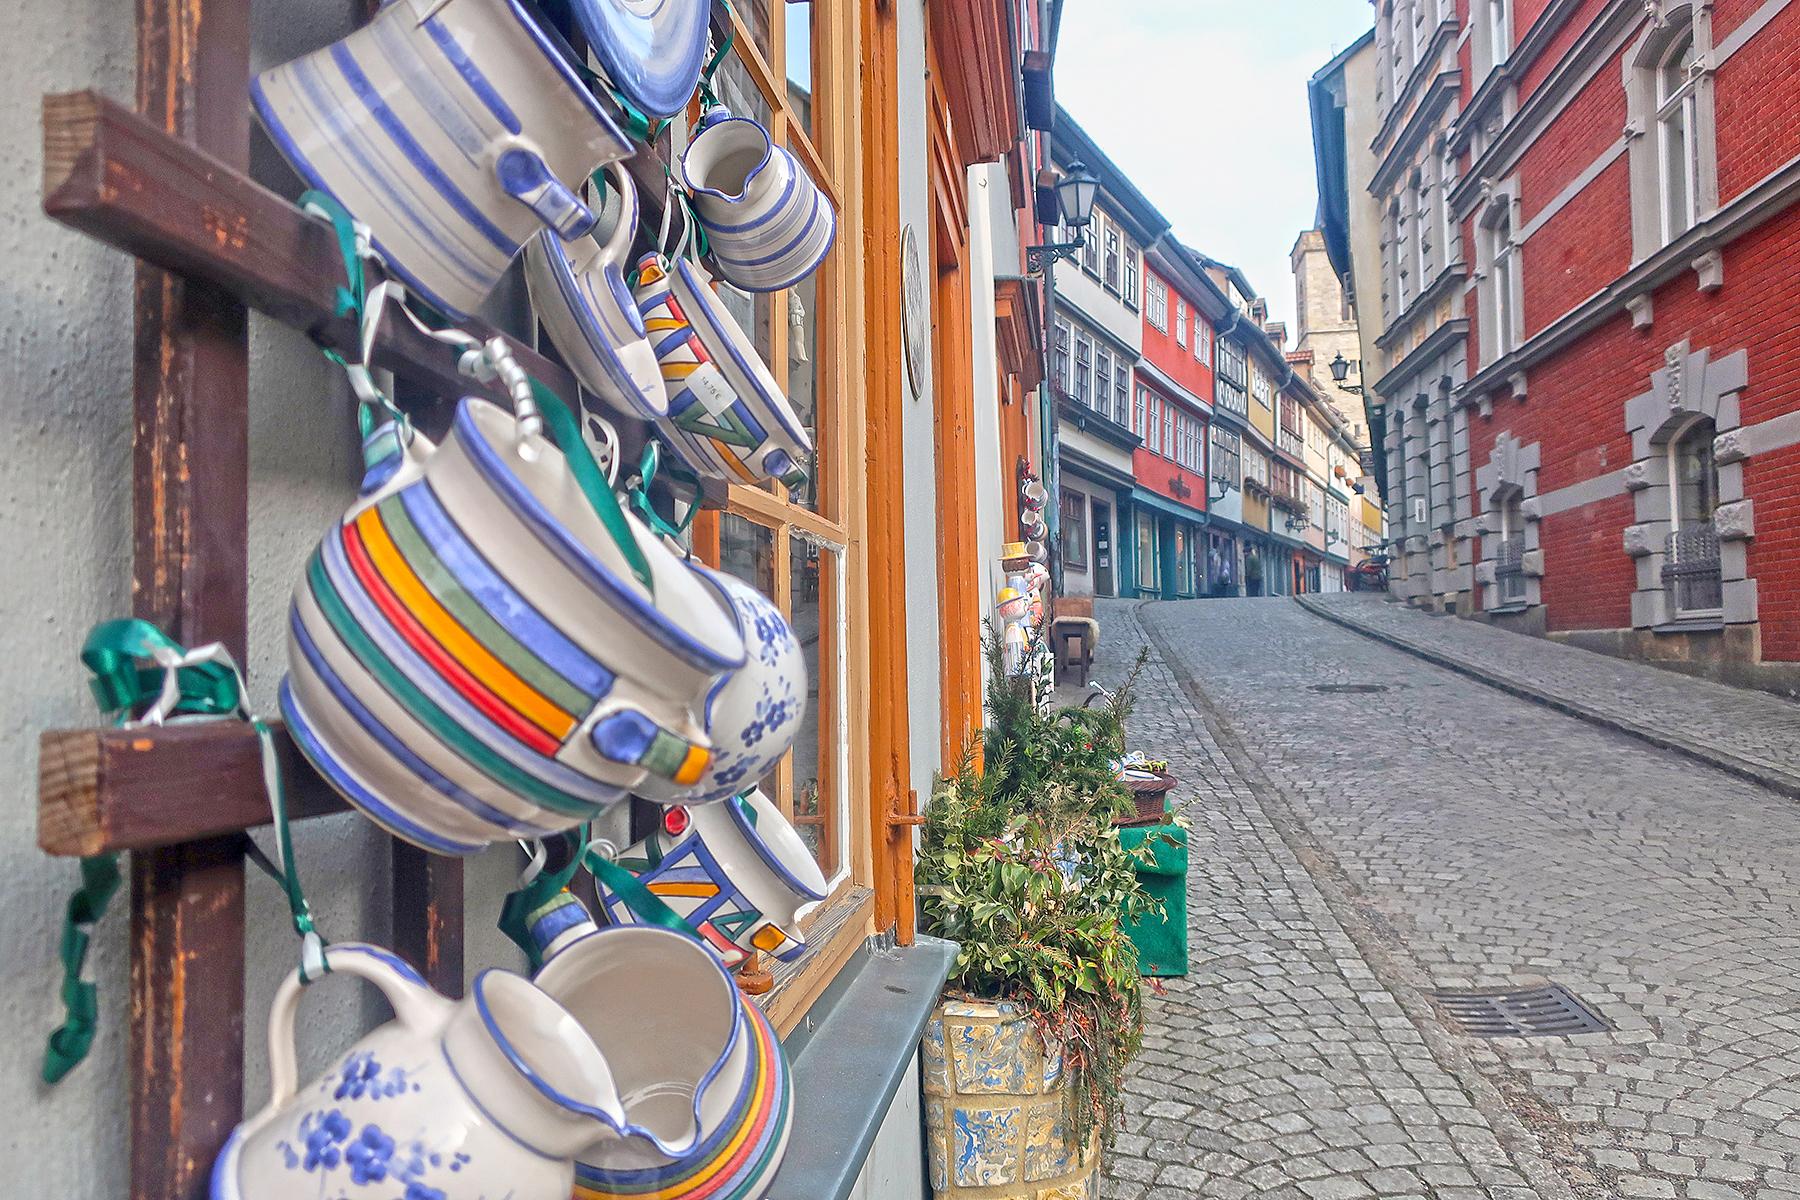 10 Fakten über die Krämerbrücke in Erfurt